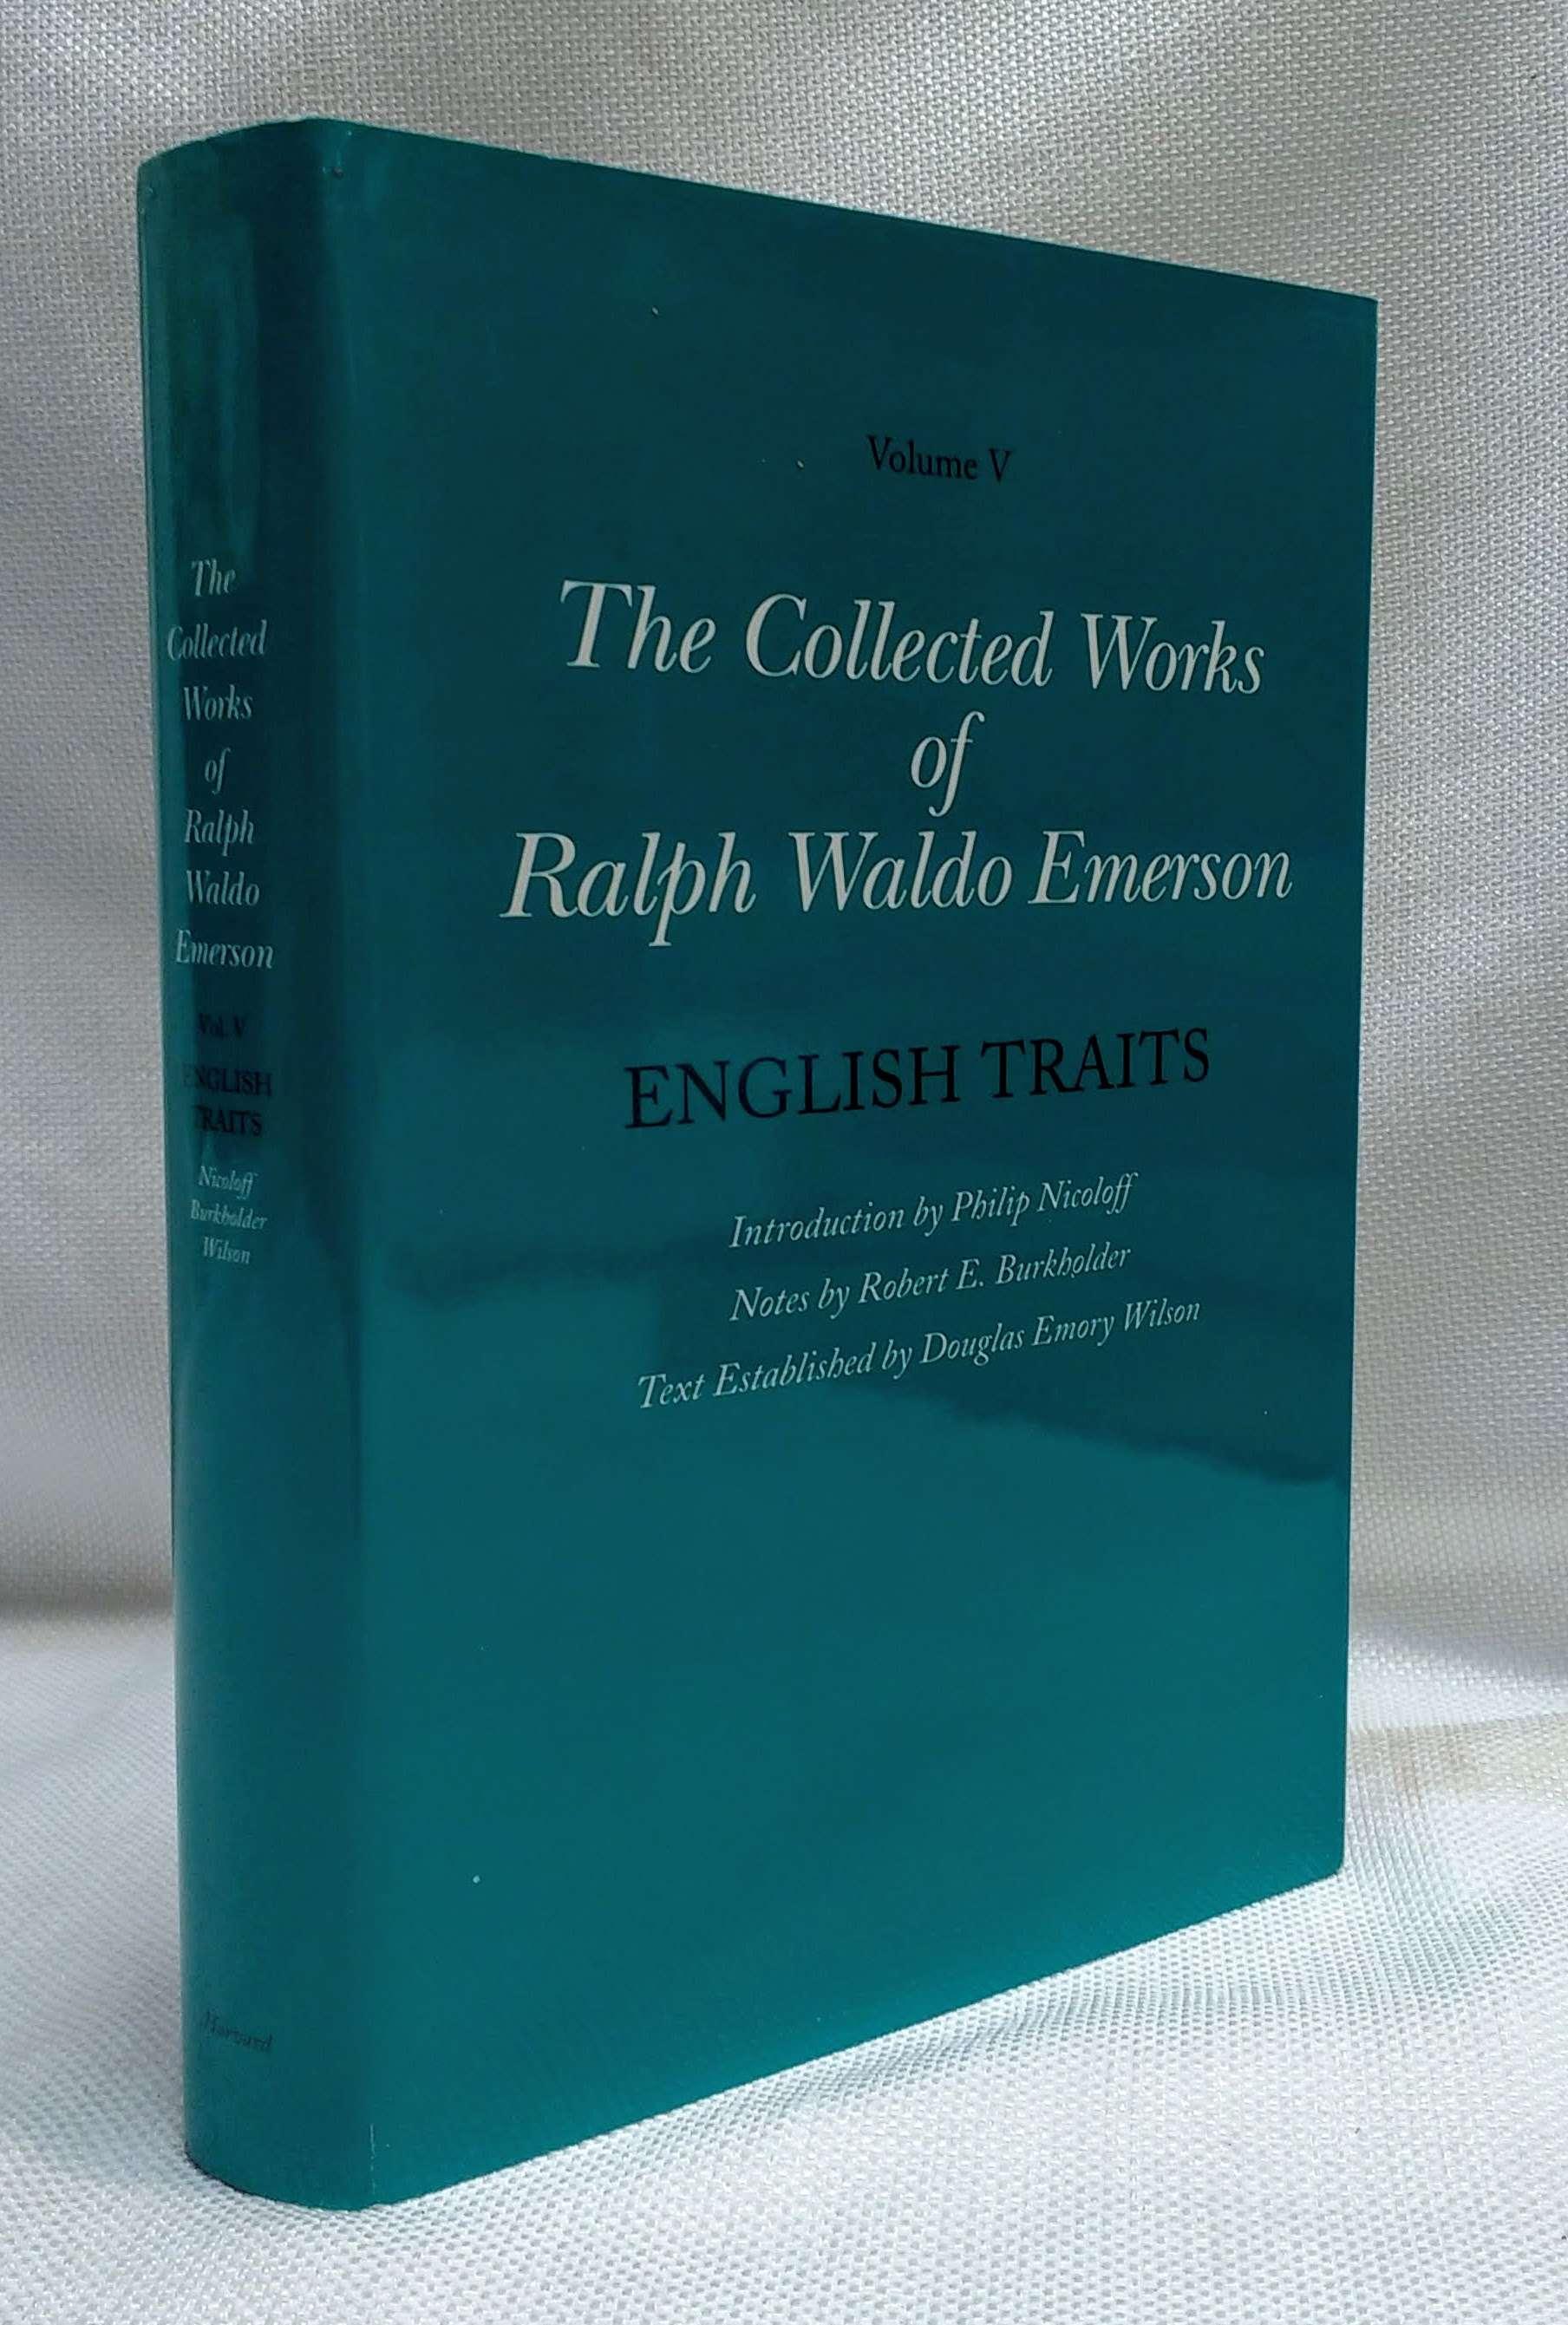 Collected Works of Ralph Waldo Emerson, Volume V: English Traits, Emerson, Ralph Waldo; Nicoloff, Philip [Editor]; Burkholder, Robert E. [Editor]; Wilson, Douglas Emory [Editor];